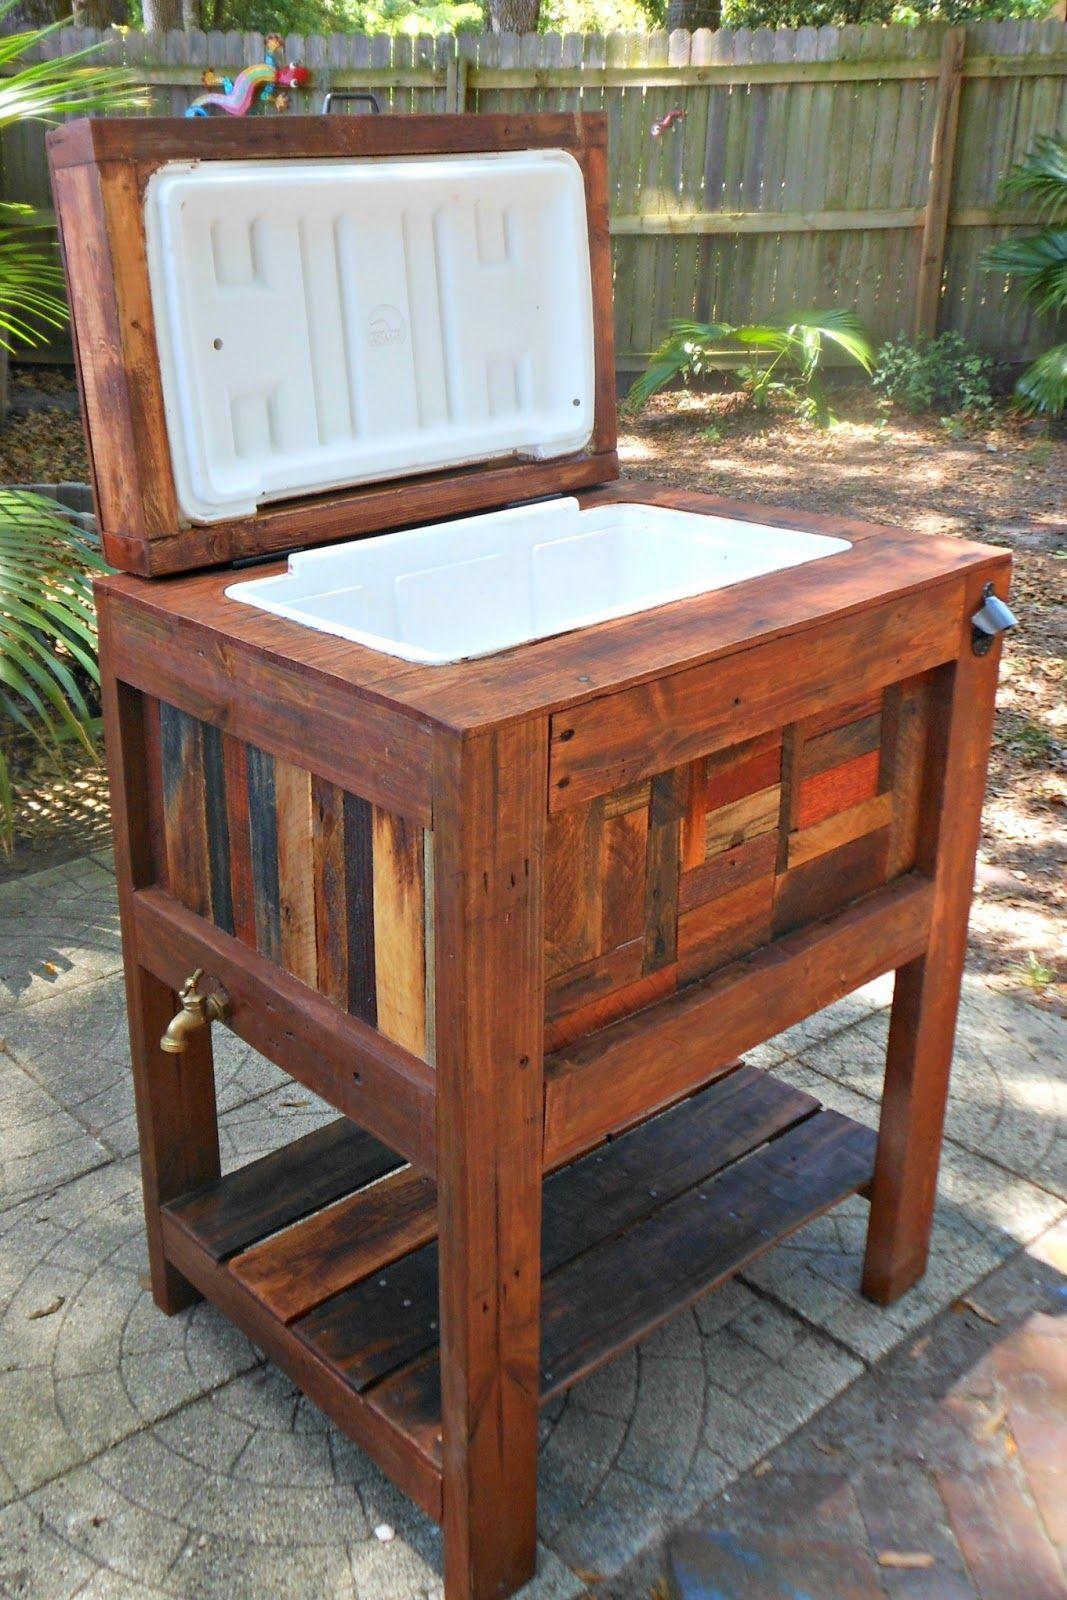 deck cooler diy - Garden Furniture Made Out Of Decking